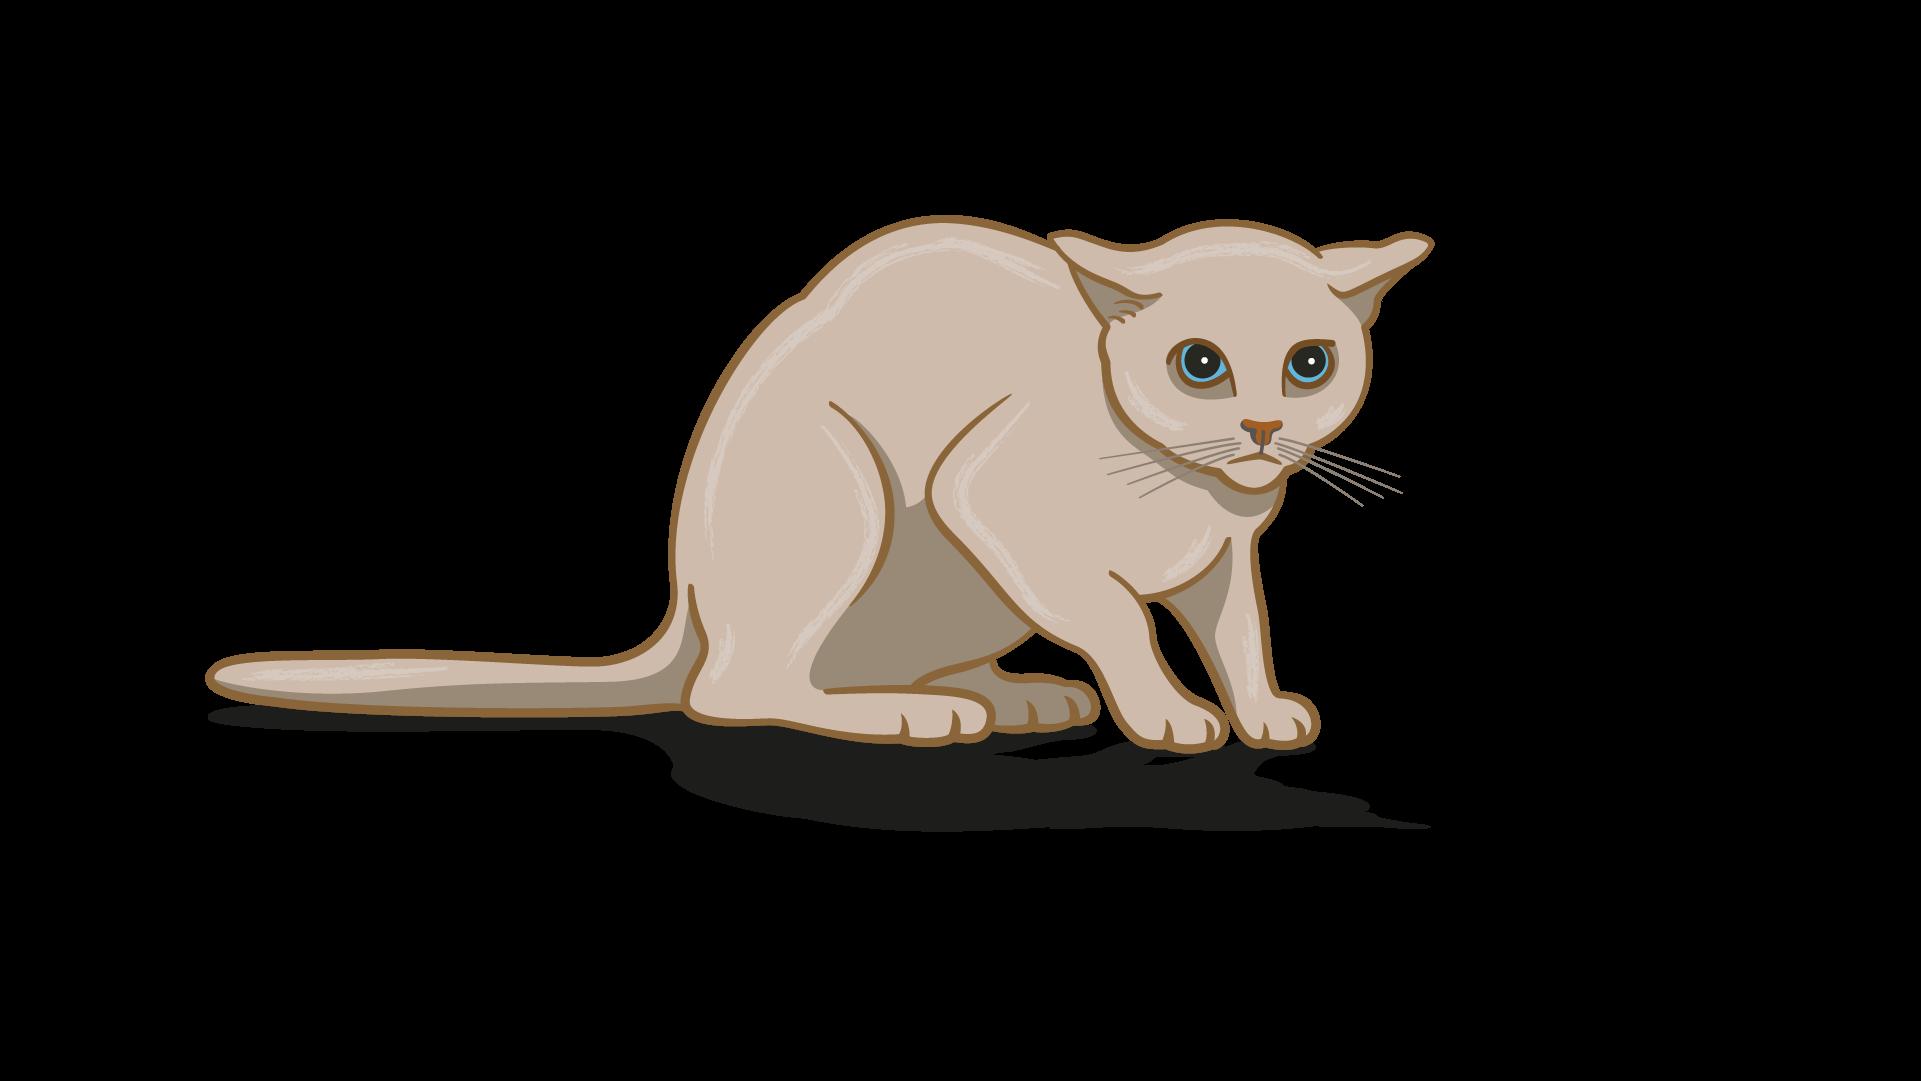 lenguaje corporal de gato ansioso